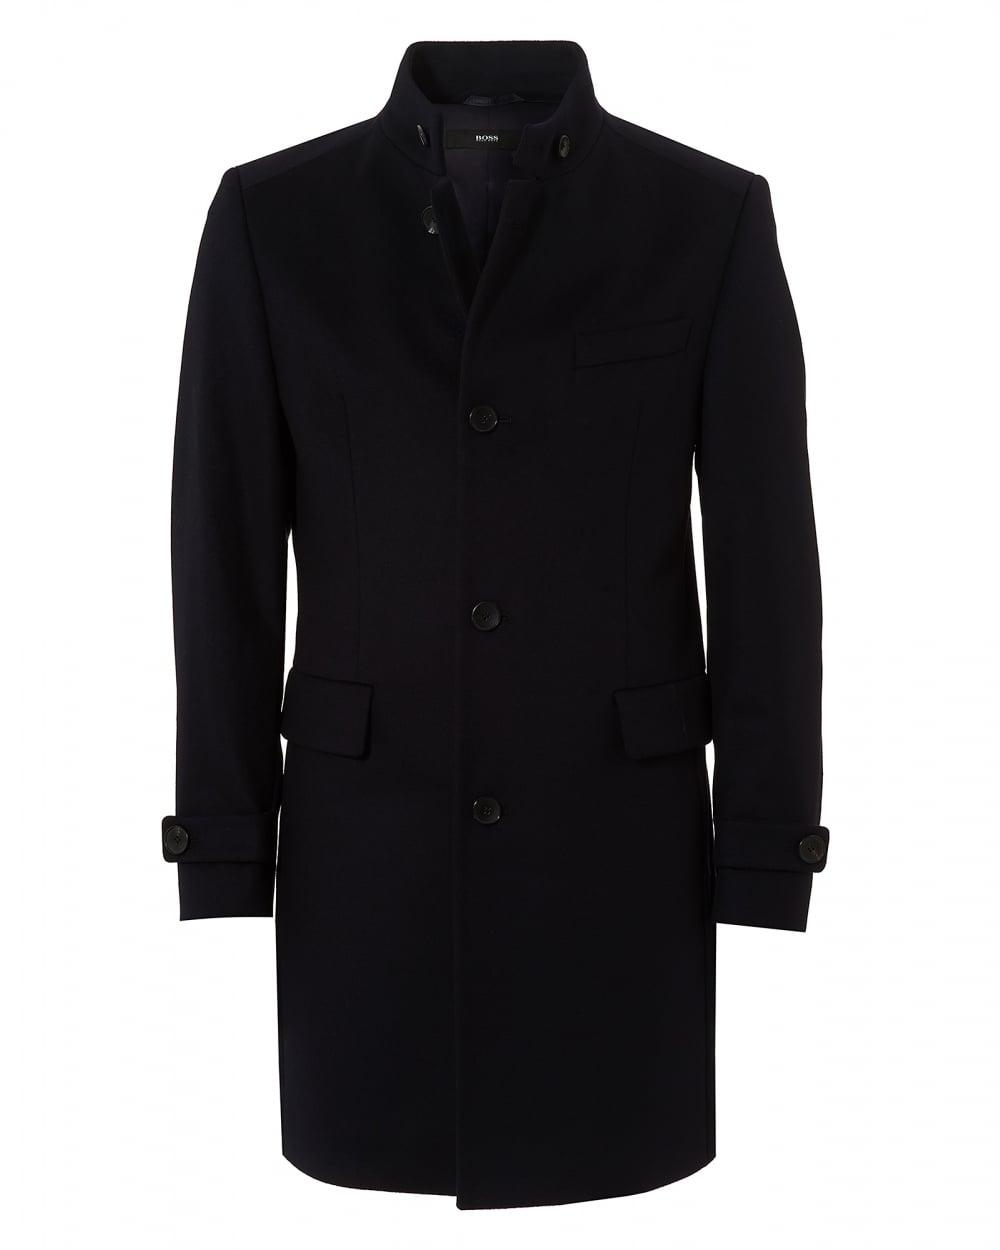 07cdf7e6fff Mens Sintrax2 Nehru Collar Wool Cashmere Navy Blue Coat